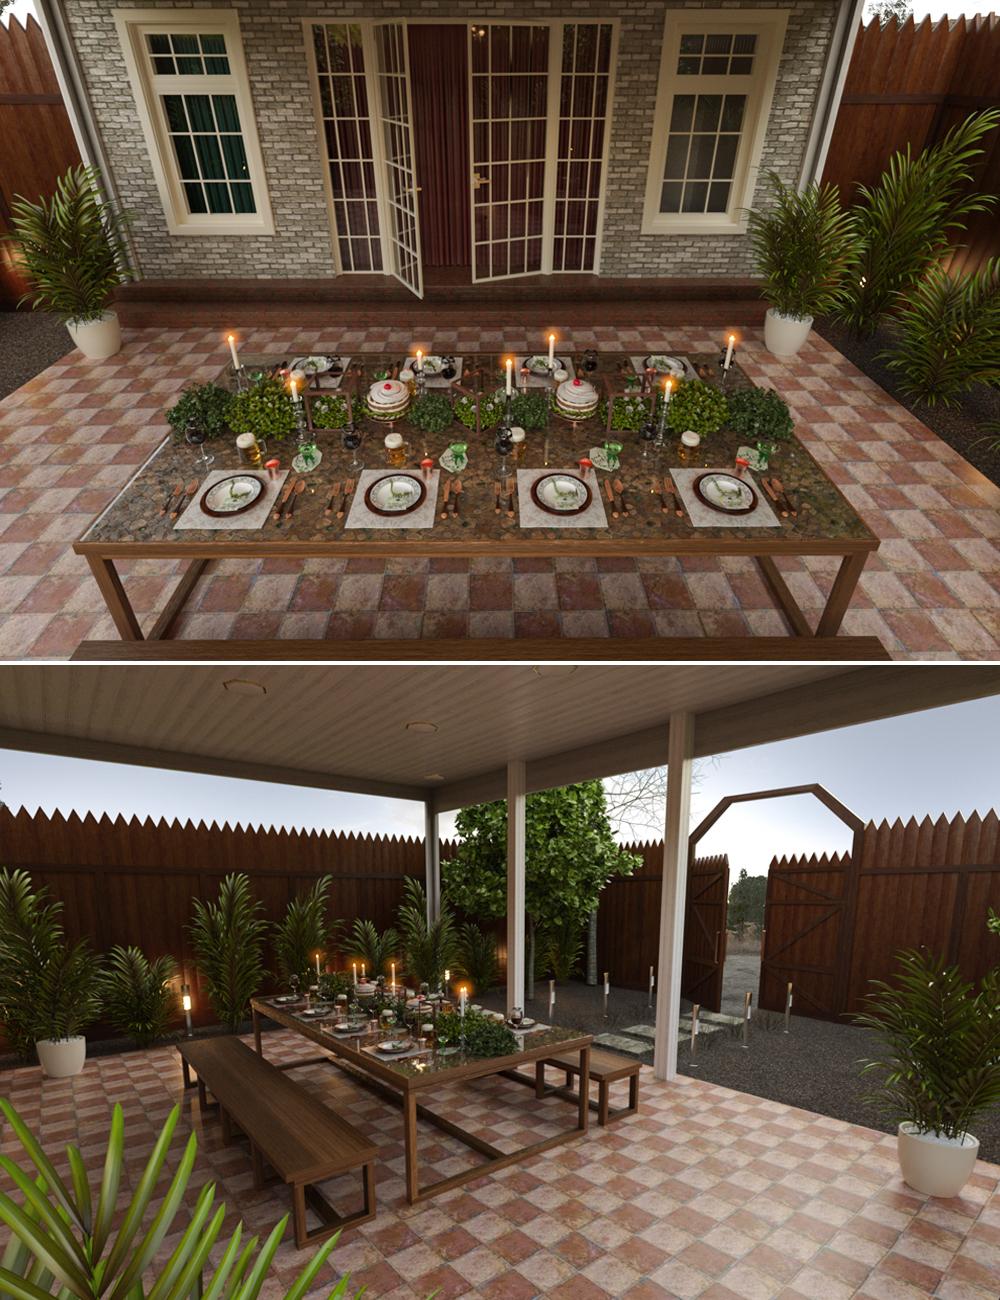 St. Patrick's Dinner by: bituka3d, 3D Models by Daz 3D